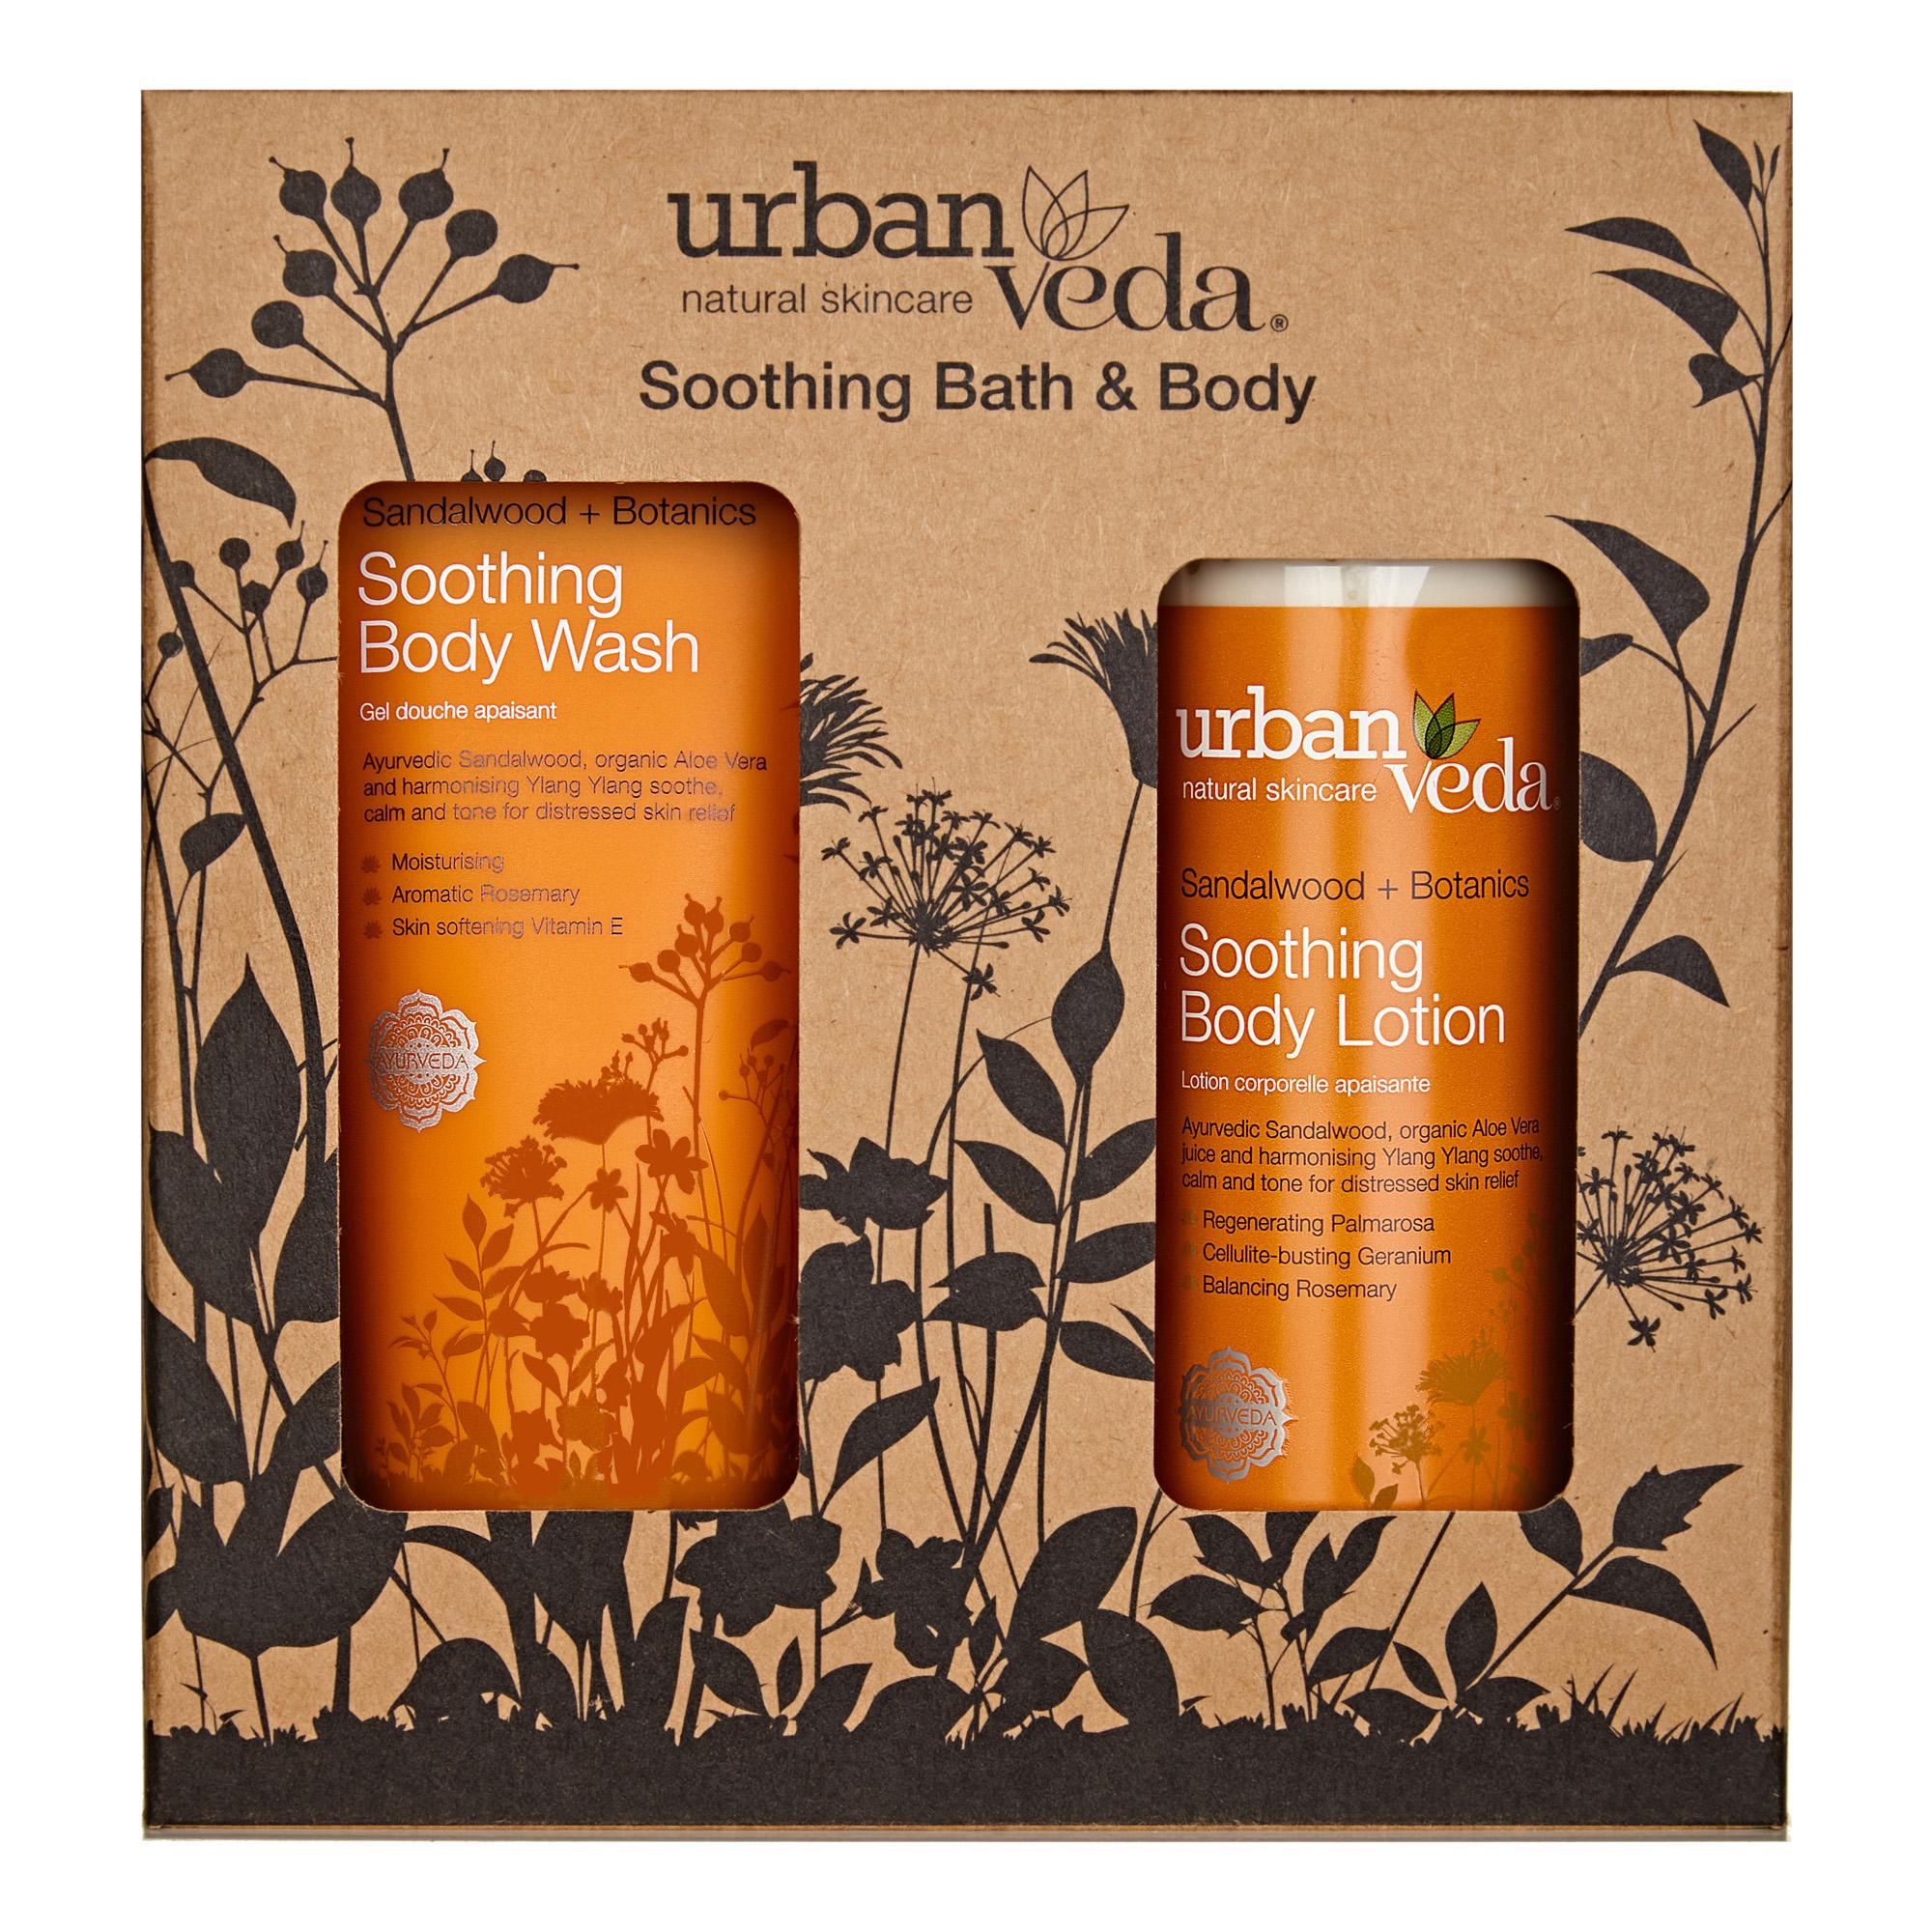 Urban Veda | Urban Veda Soothing Bath & Body